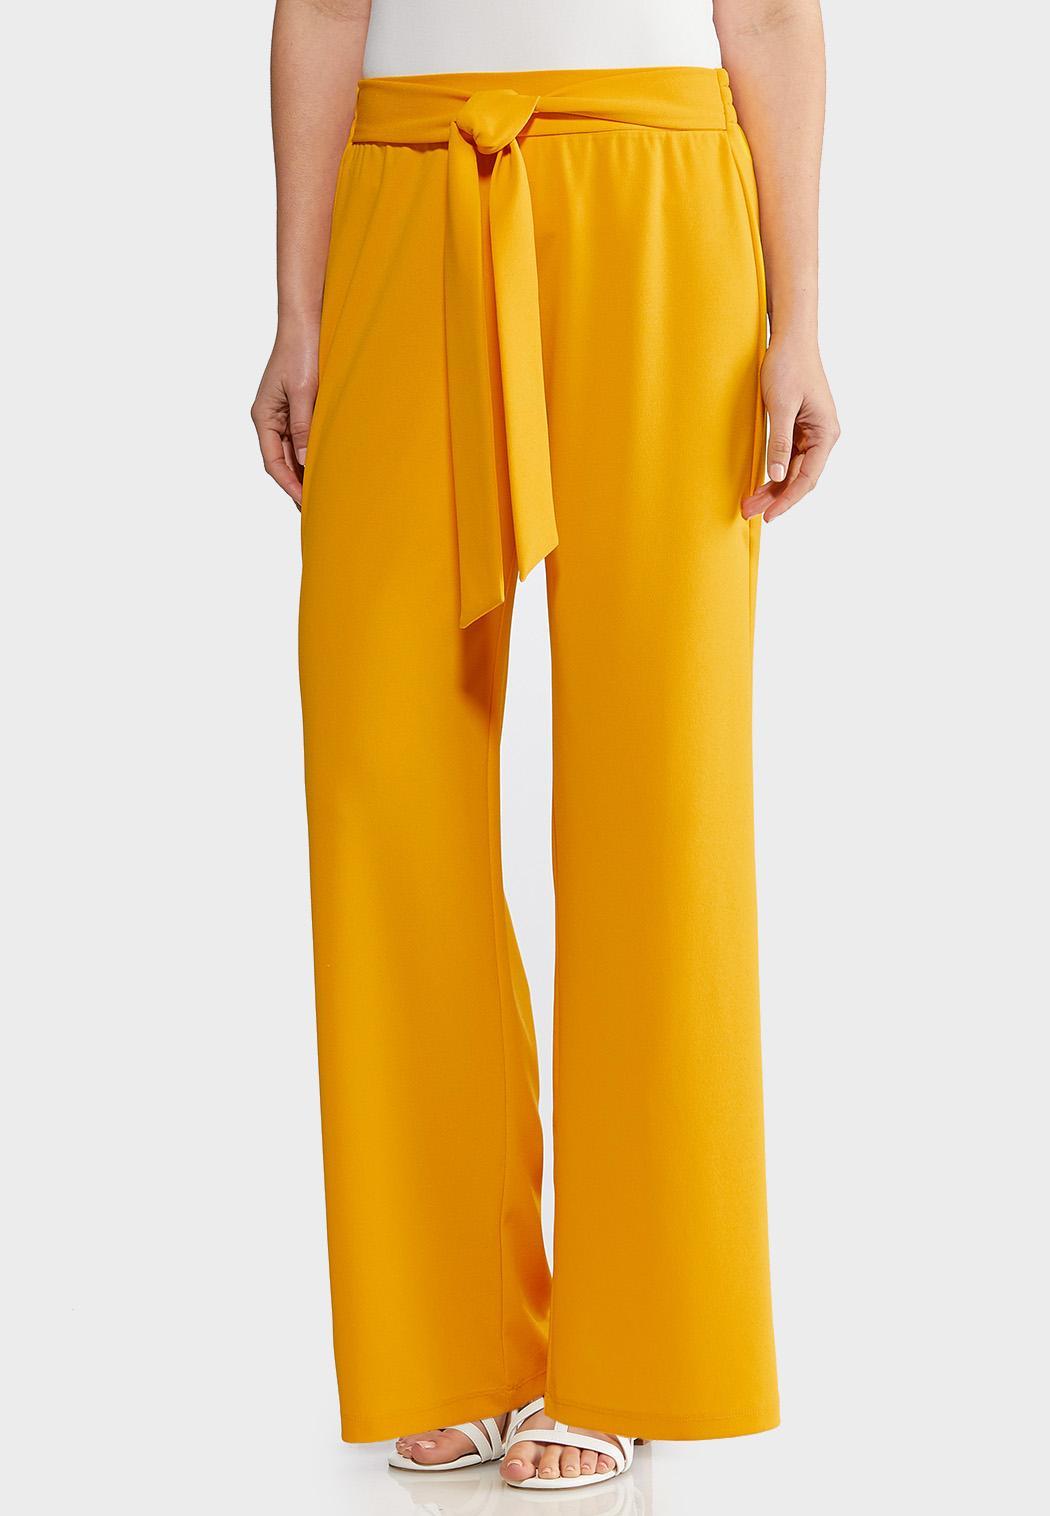 22f1e4ecd75 Tie Waist Wide Leg Pants Wide Leg Cato Fashions